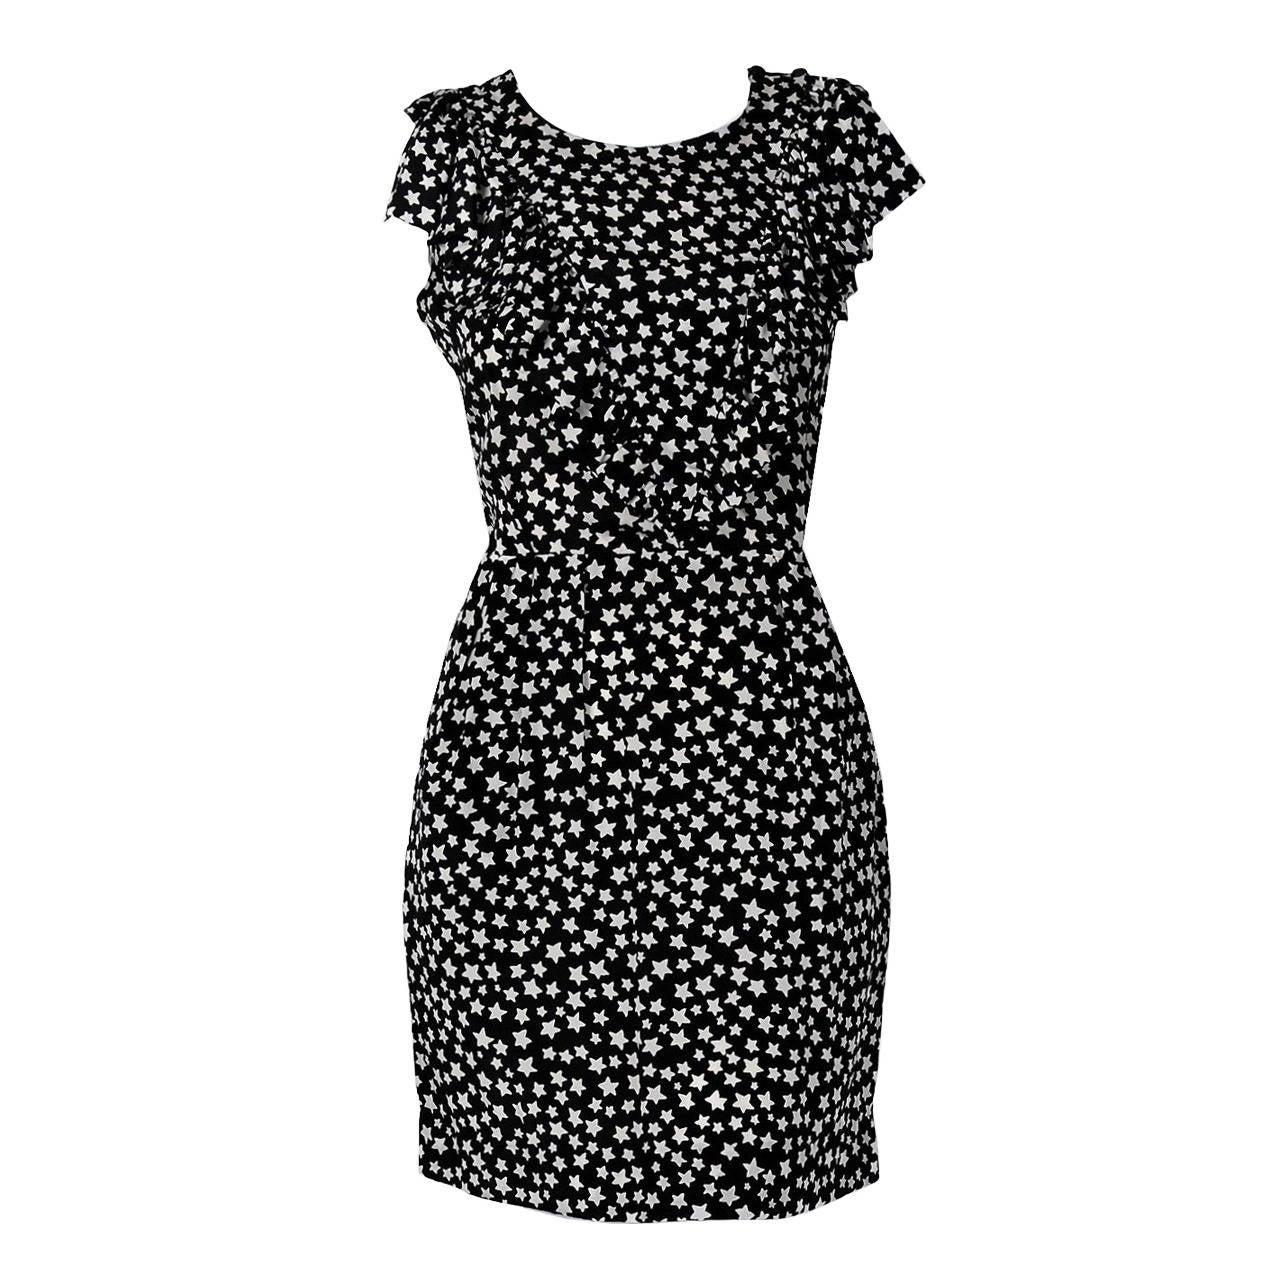 01fd9170cb4 1980's Yves Saint Laurent Star-Print Novelty Silk Ruffle Sleeveless Mini  Dress For Sale